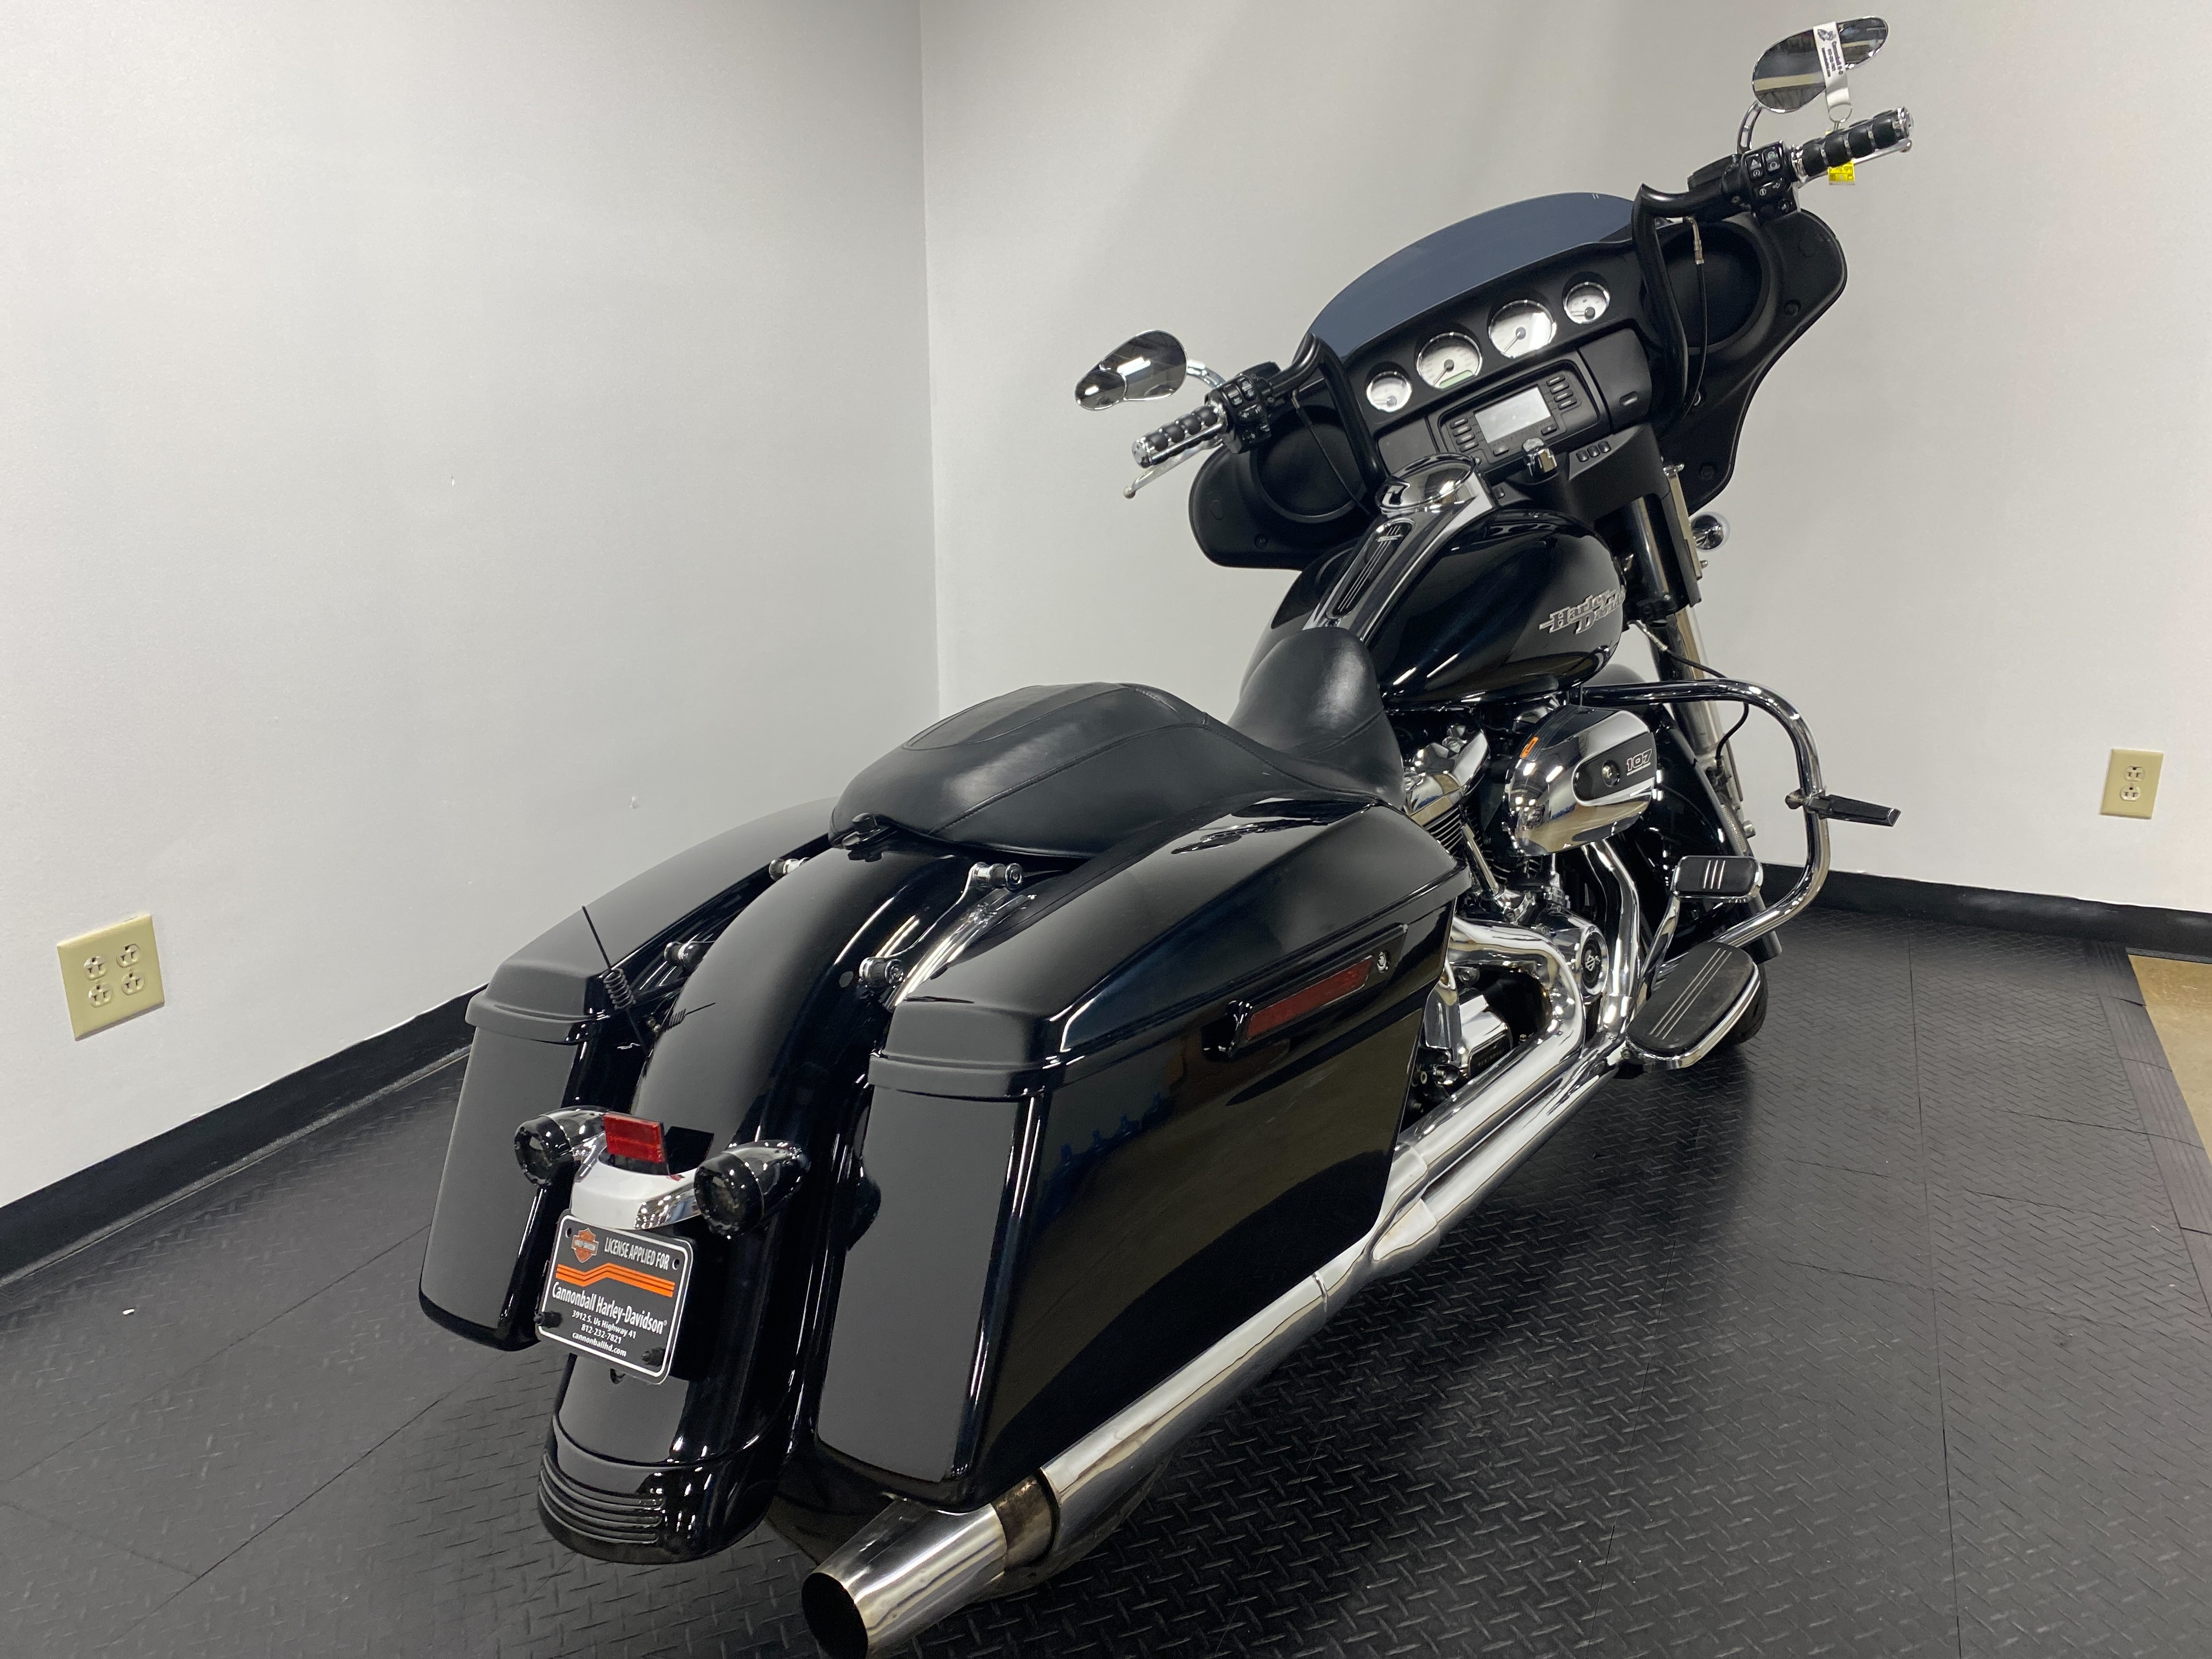 2017 Harley-Davidson Street Glide Base at Cannonball Harley-Davidson